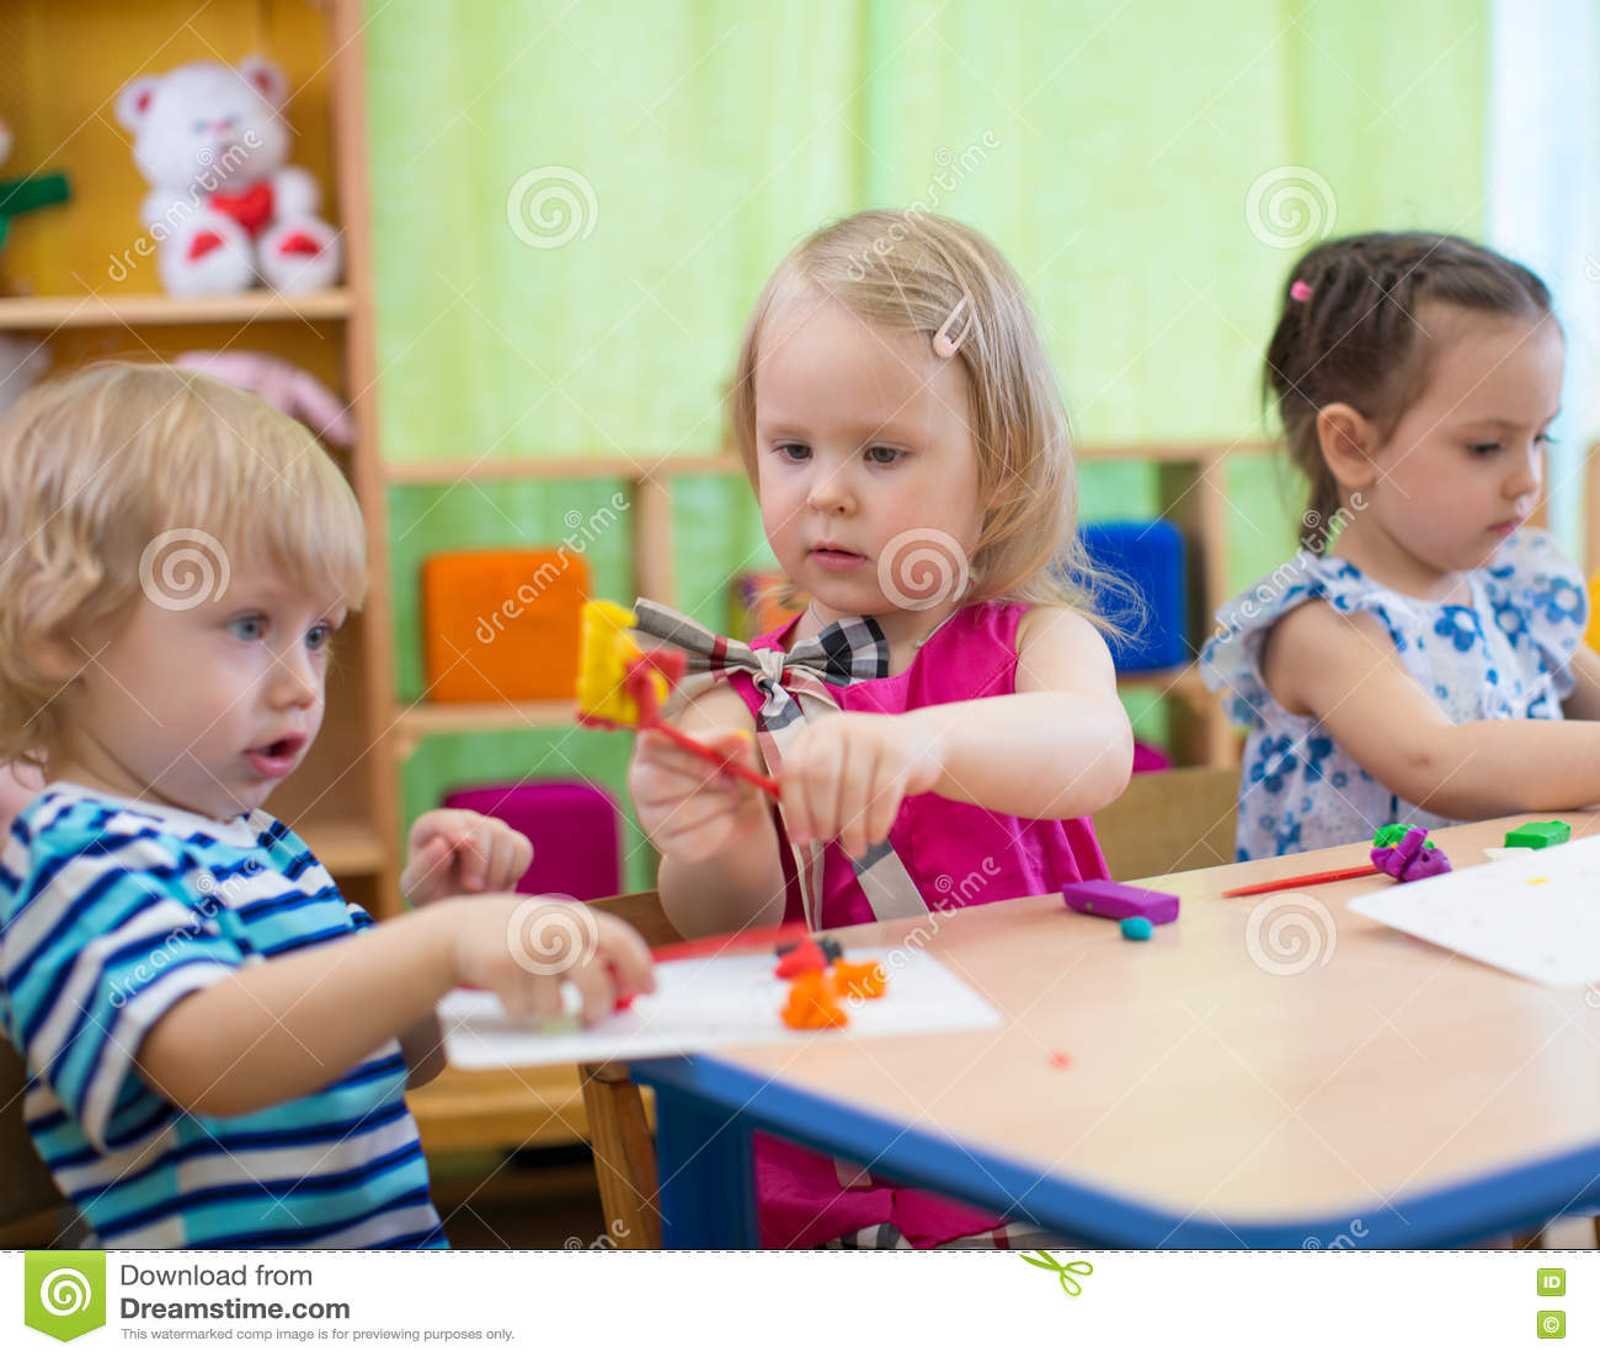 Kids Or Children Creating Arts And Crafts In Kindergarten Girl Is